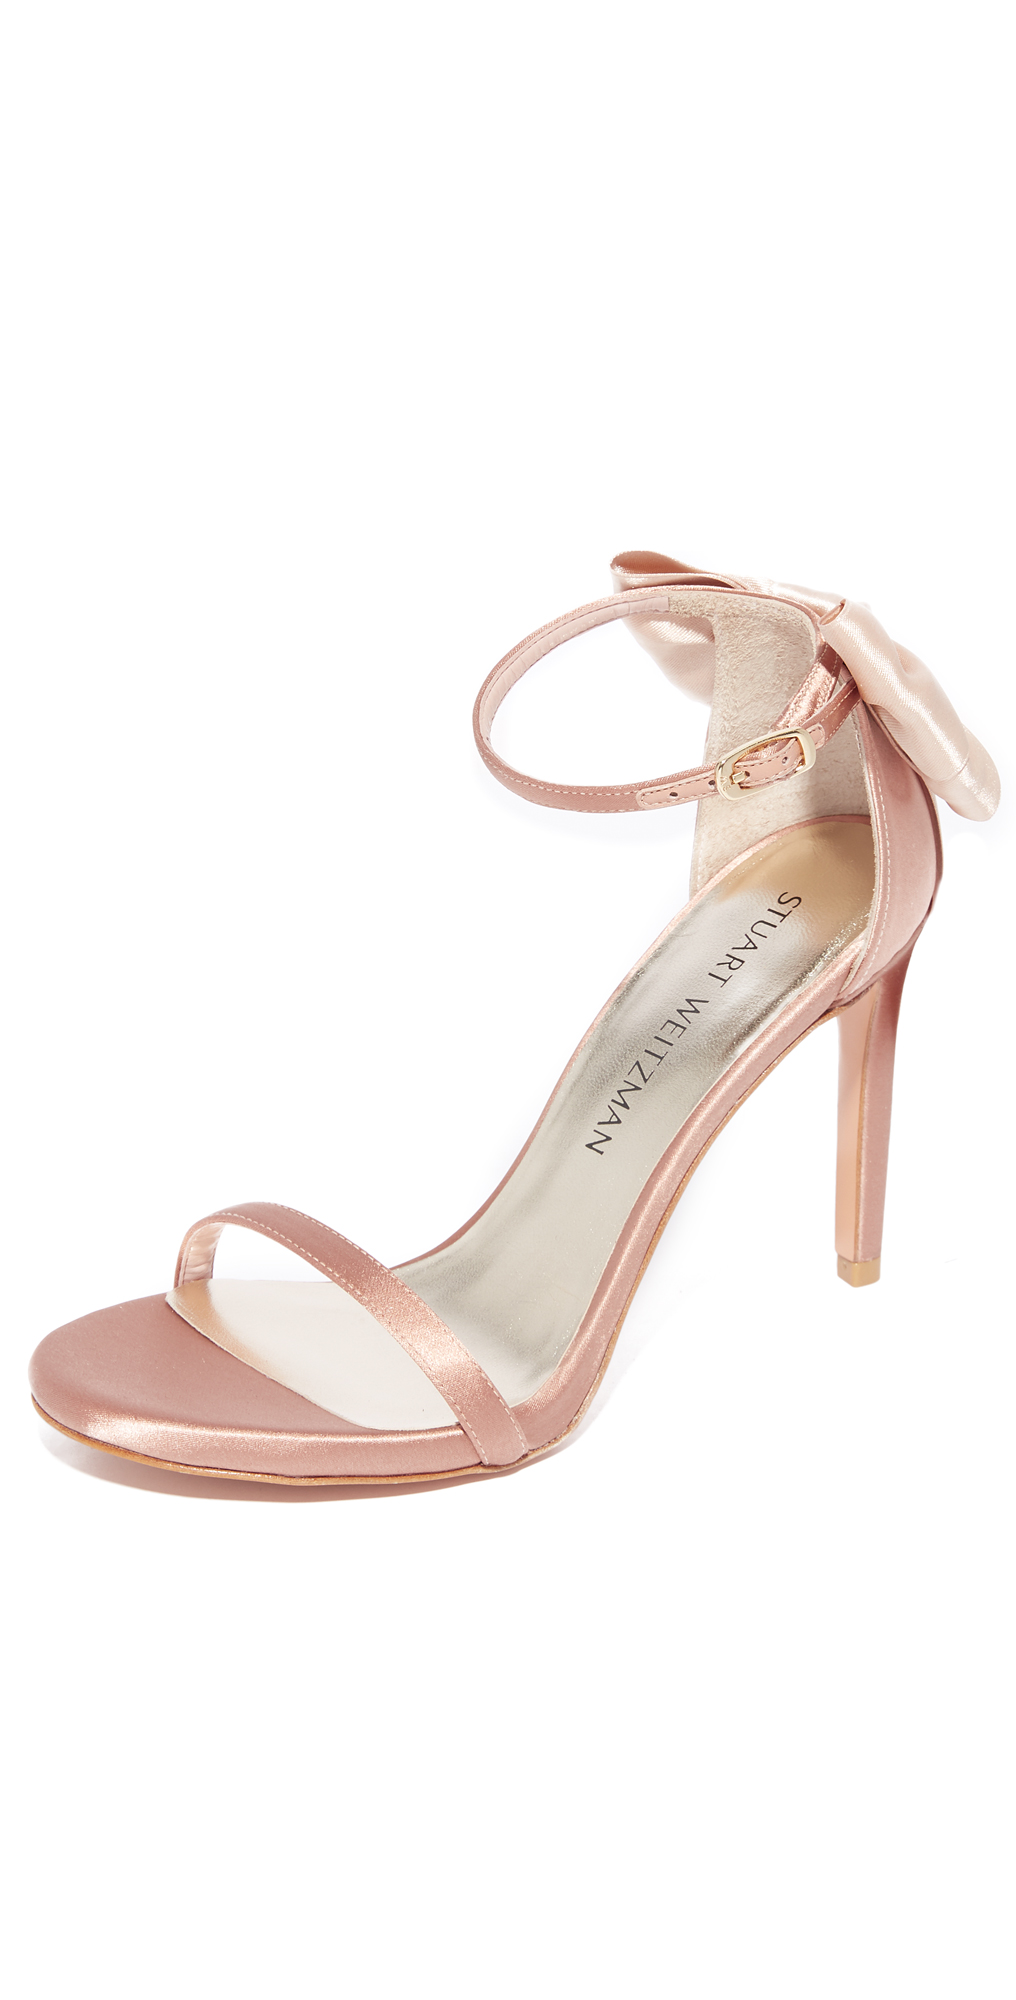 Mybow Sandals Stuart Weitzman